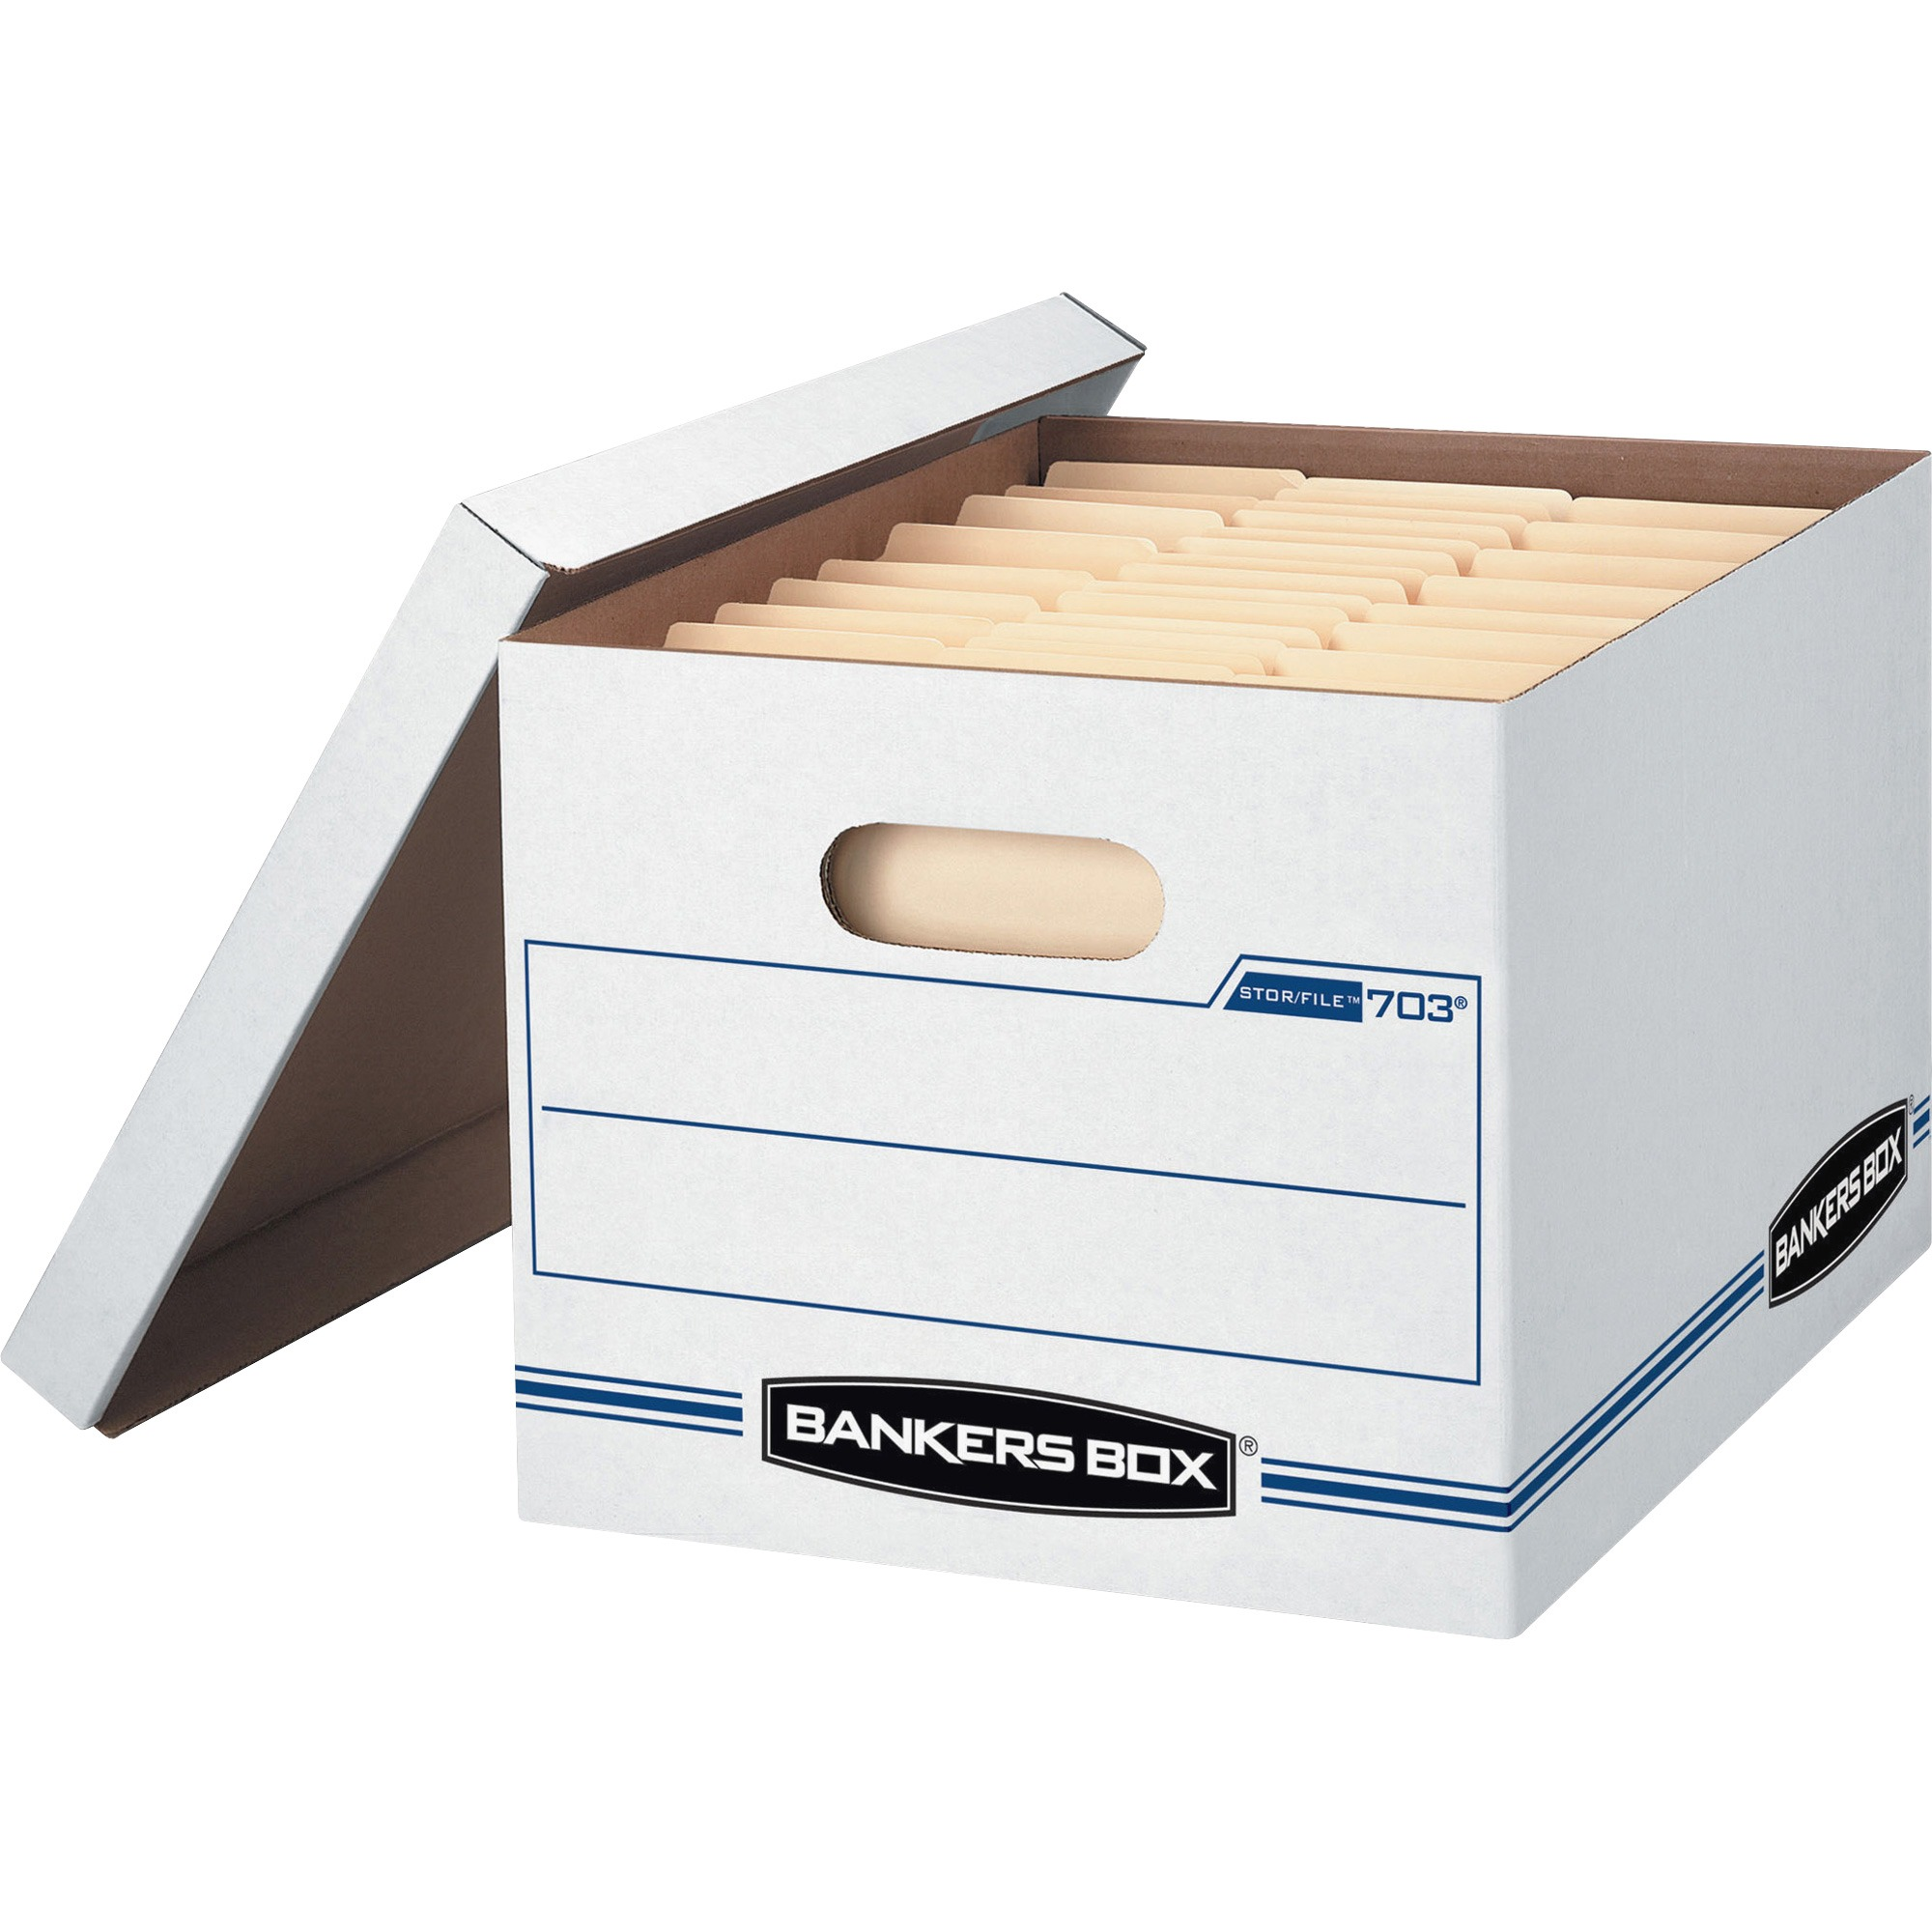 Bankers Box Letter/Legal Size Storage Box, 4/Carton